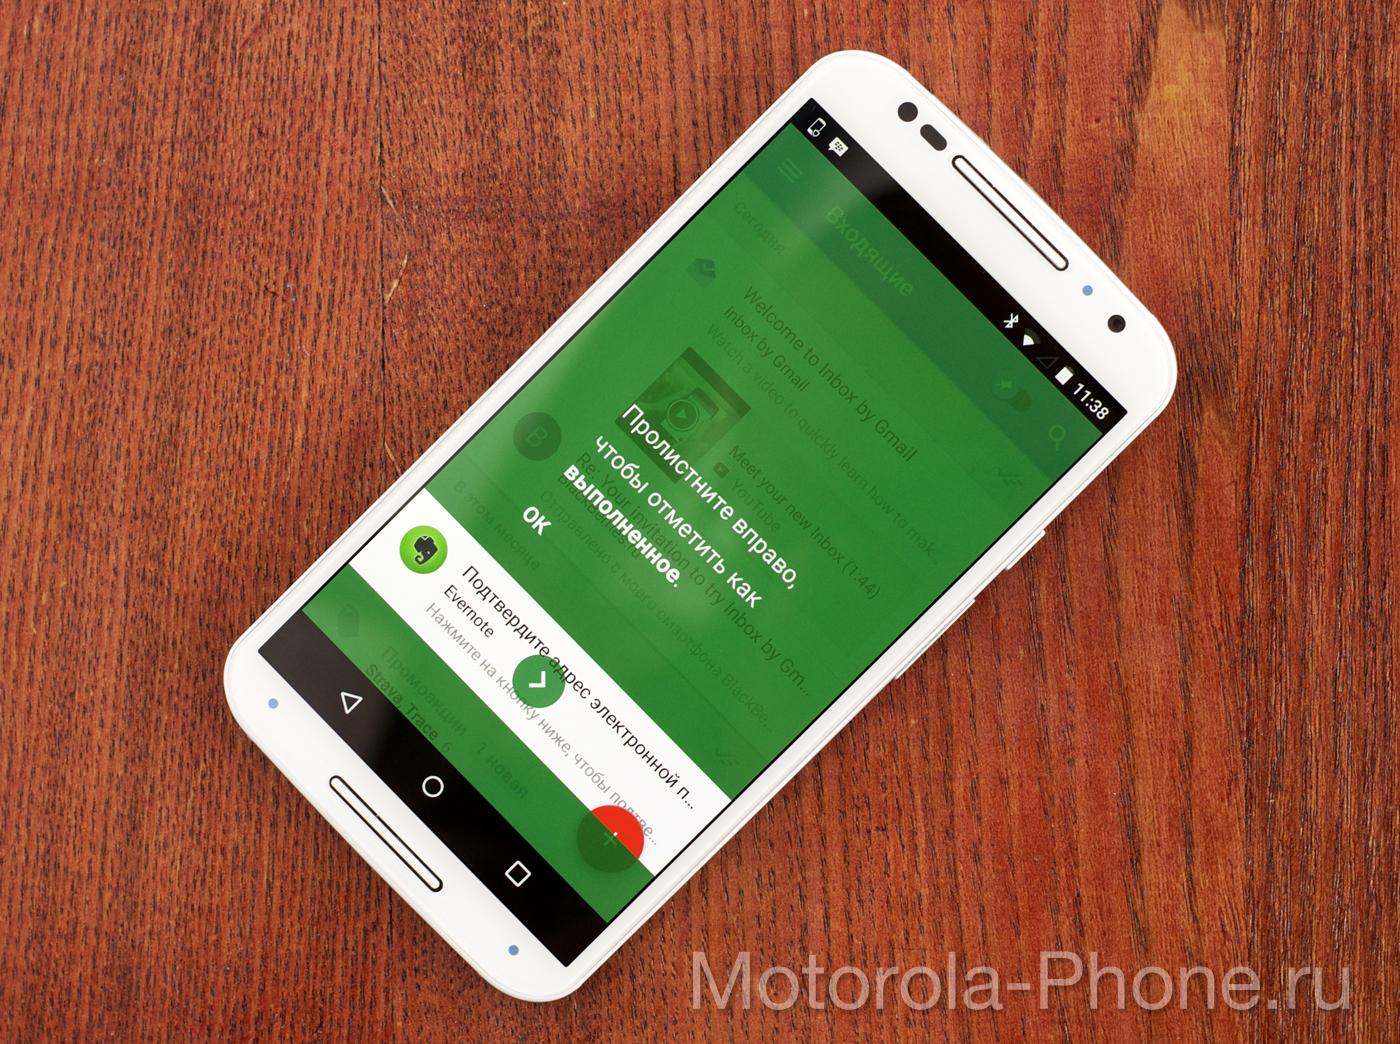 Motorola-Moto-X-Inbox-04